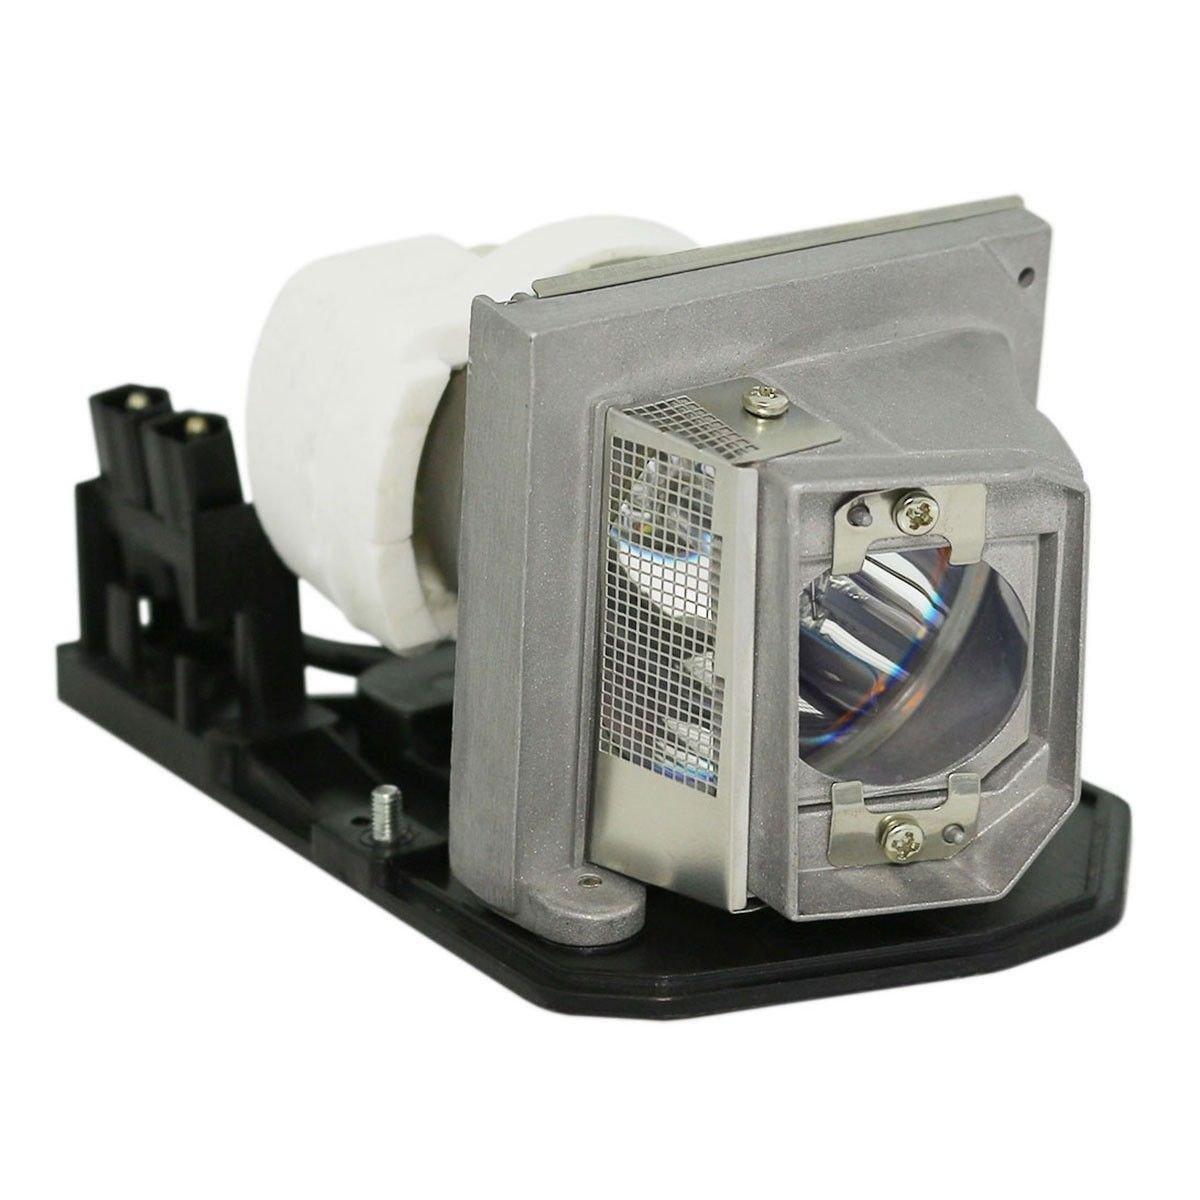 EC.JBU00.001 - Lá mpara de repuesto para proyector ACER X110P/X1161P/X1261P/H110P/X1161PA/X1161N Supermait